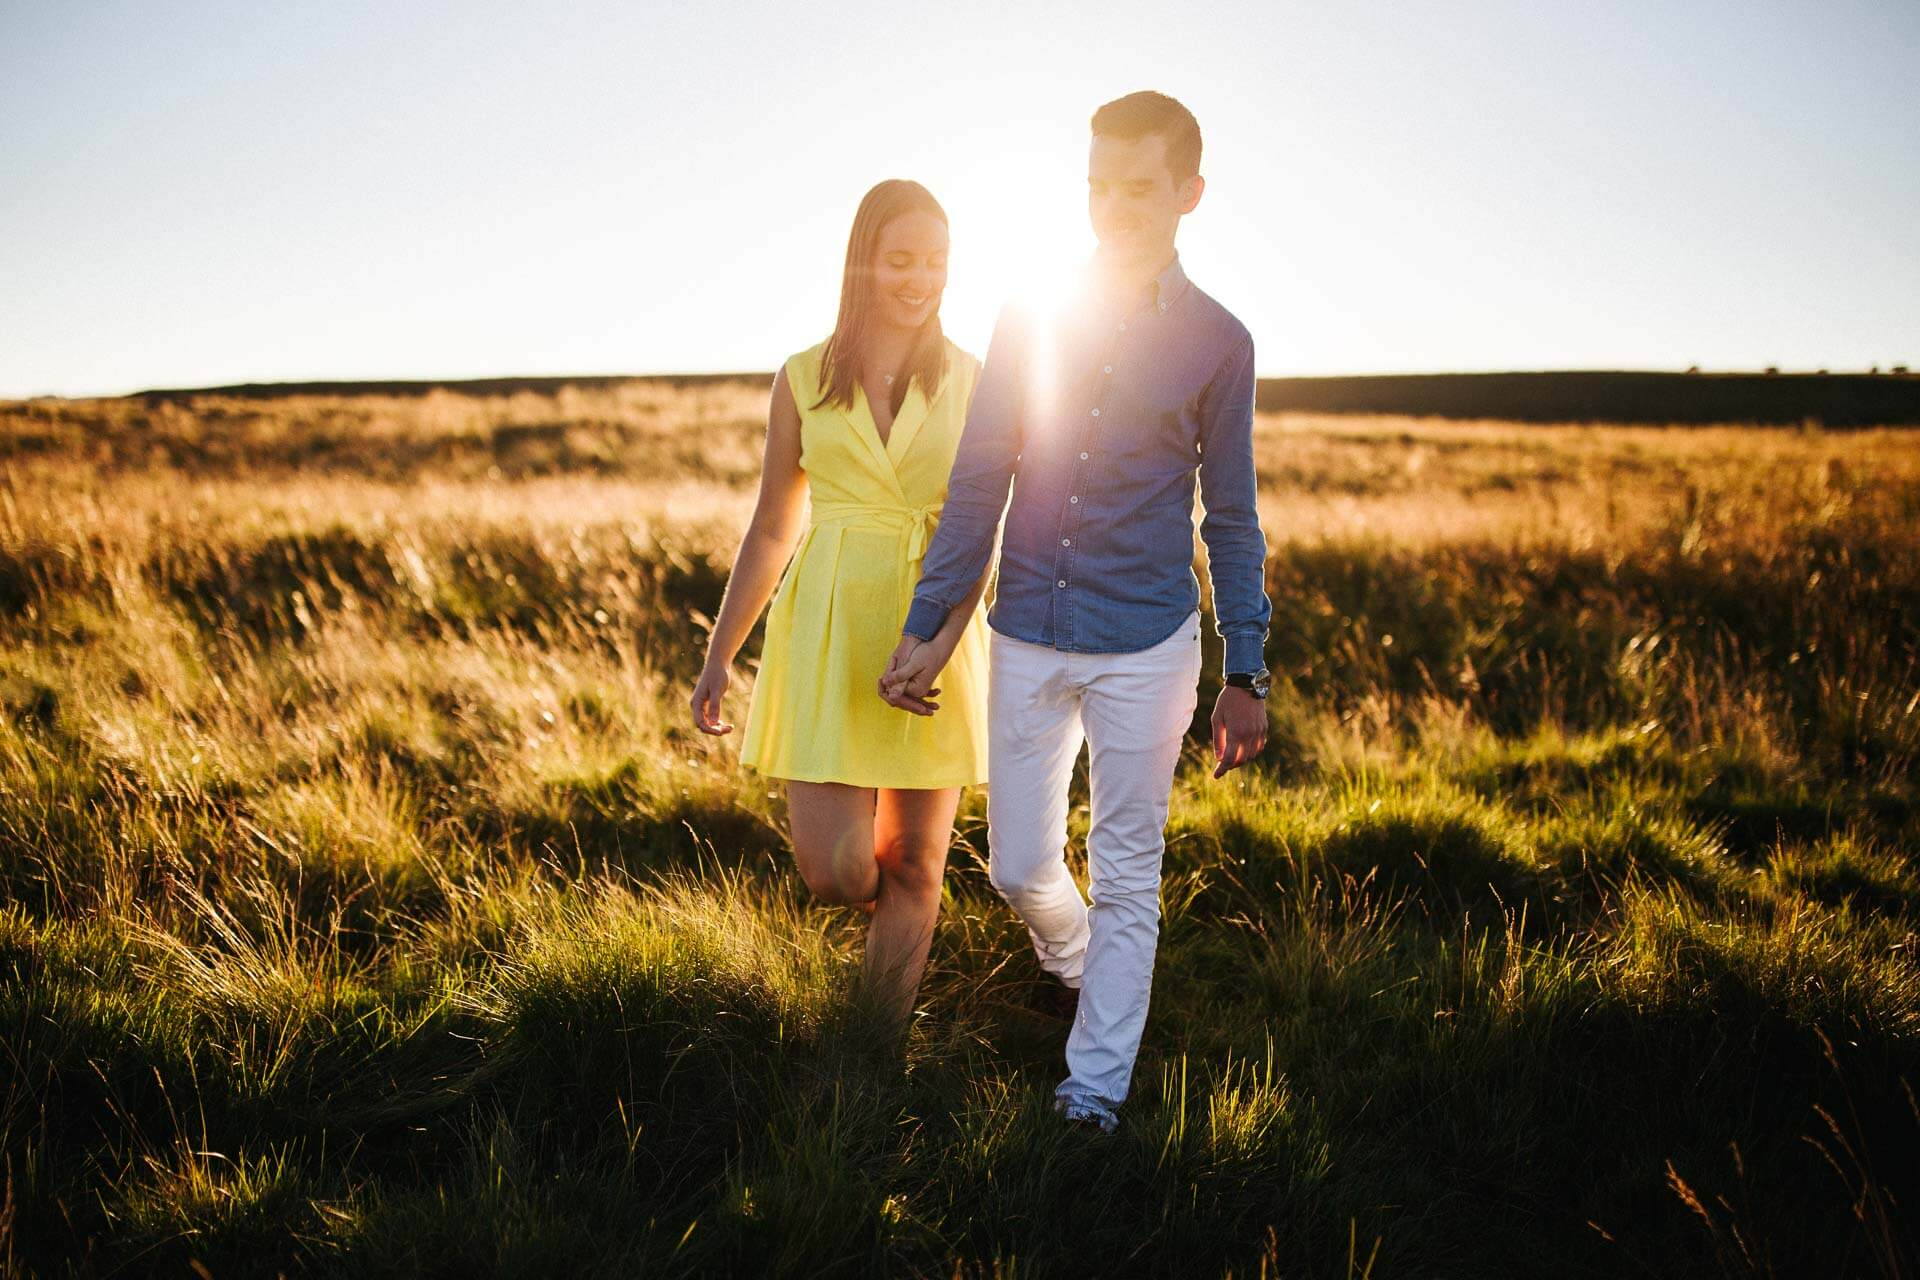 photographe-couple-nature-manon-gaetan-12